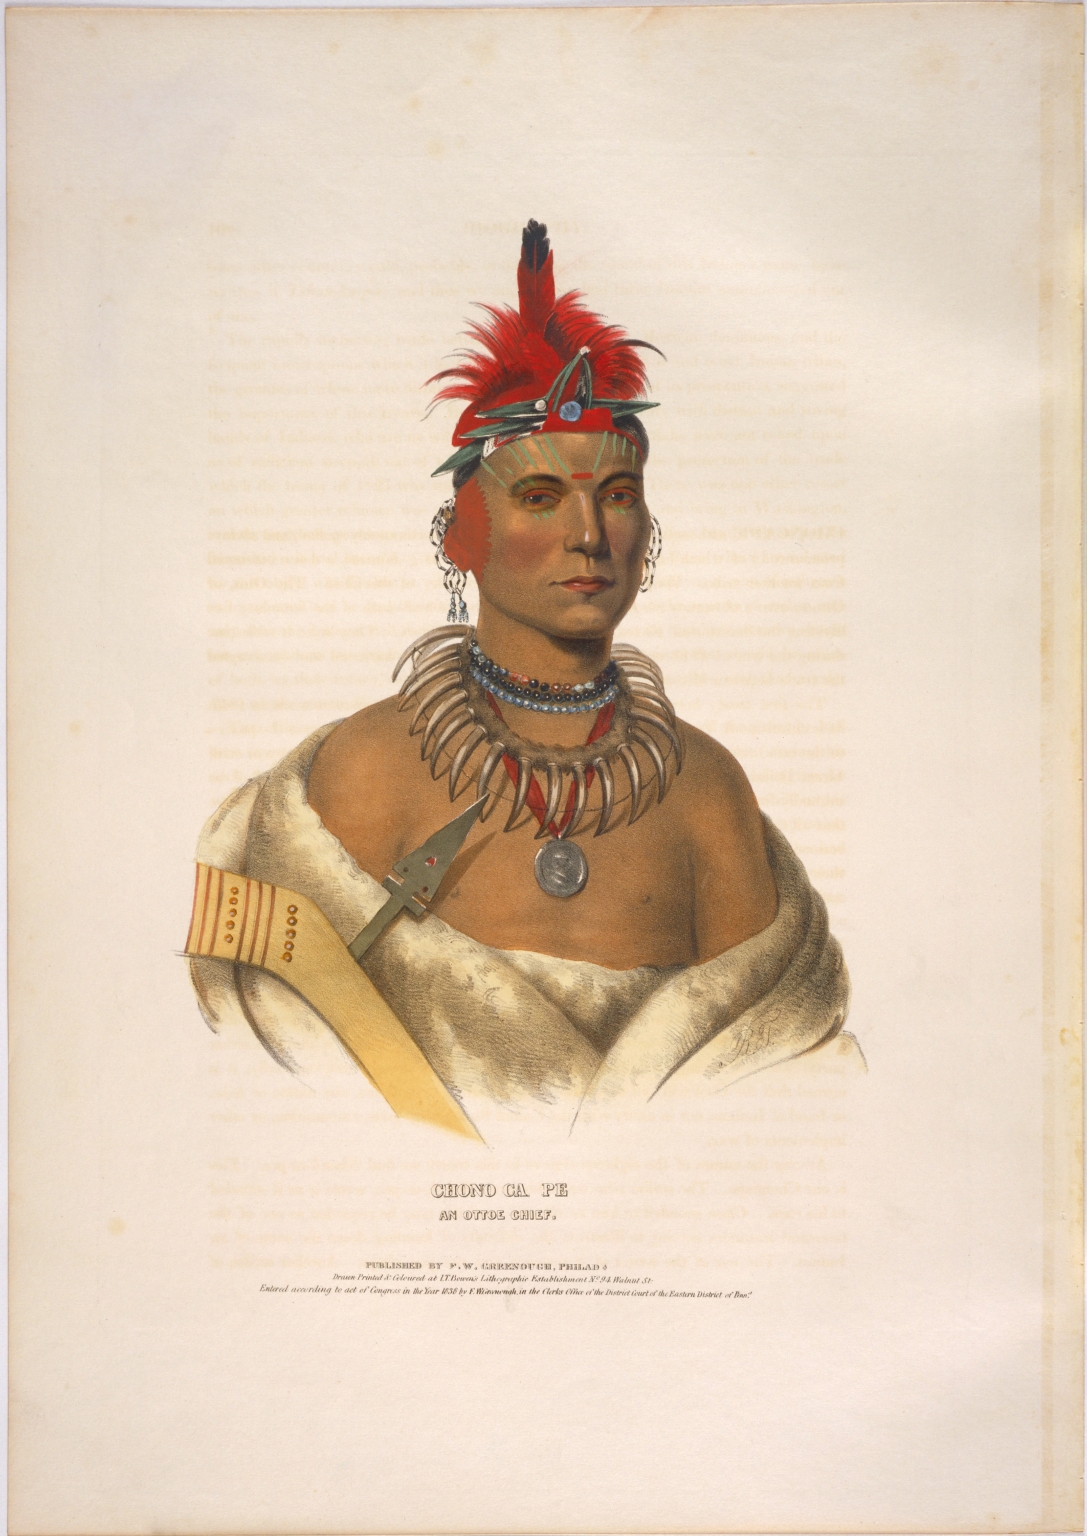 Chono Cape, an Ottoe chief